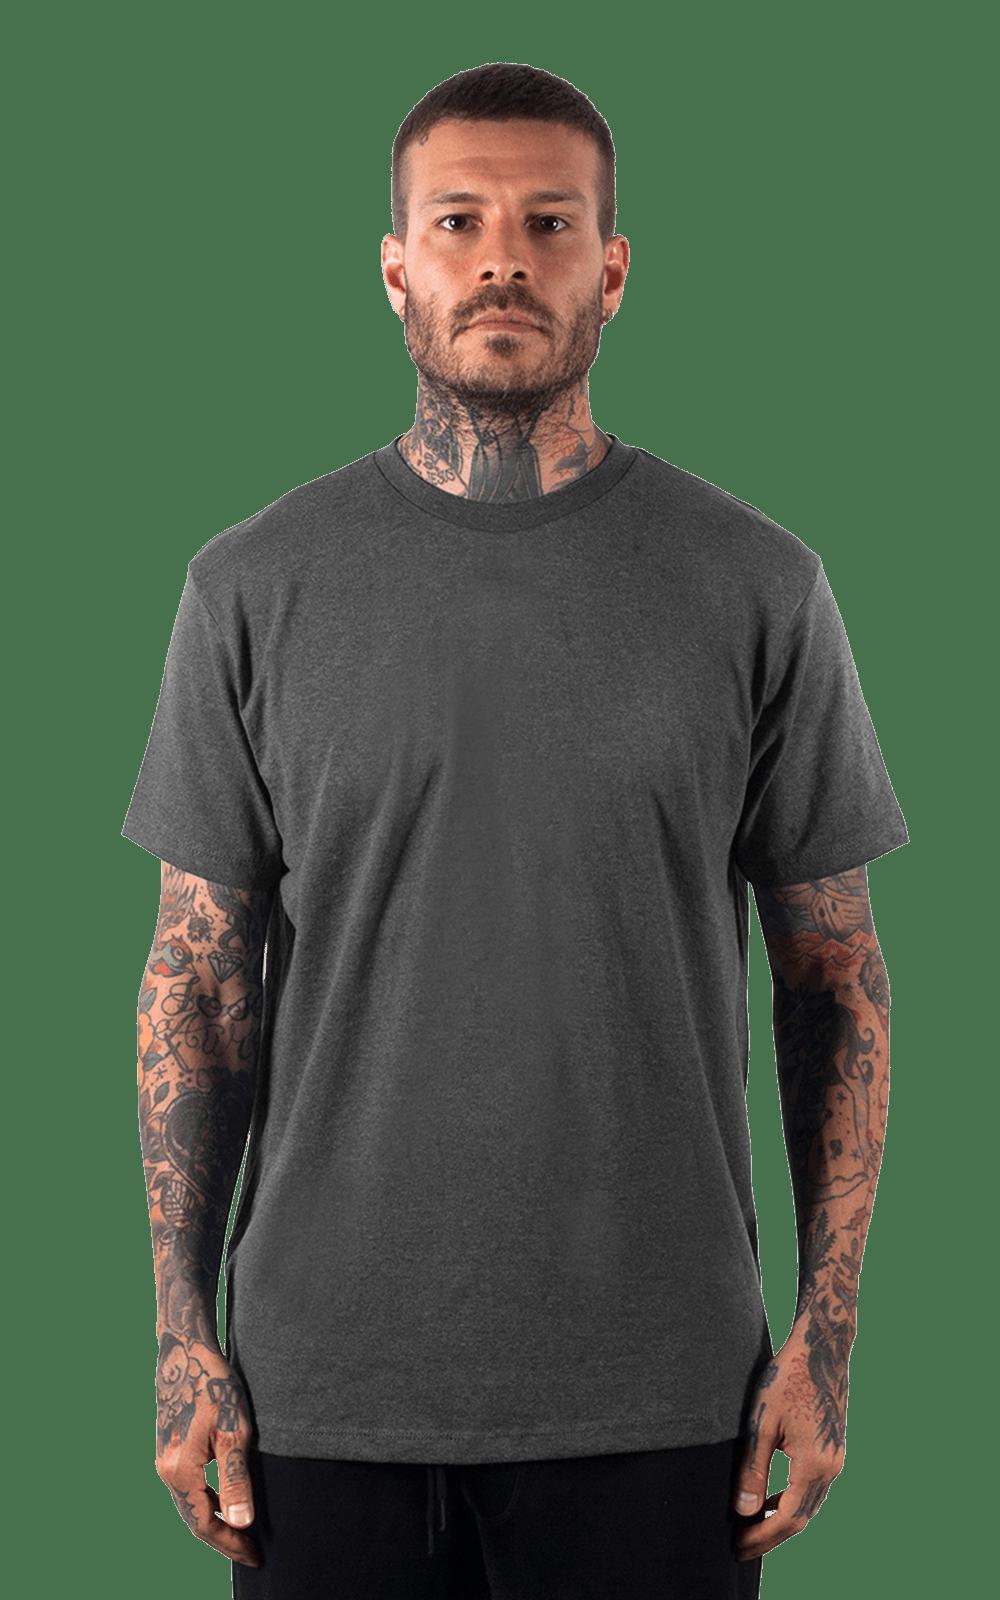 Camiseta_Tubo_ArticGrayHTR_Frente